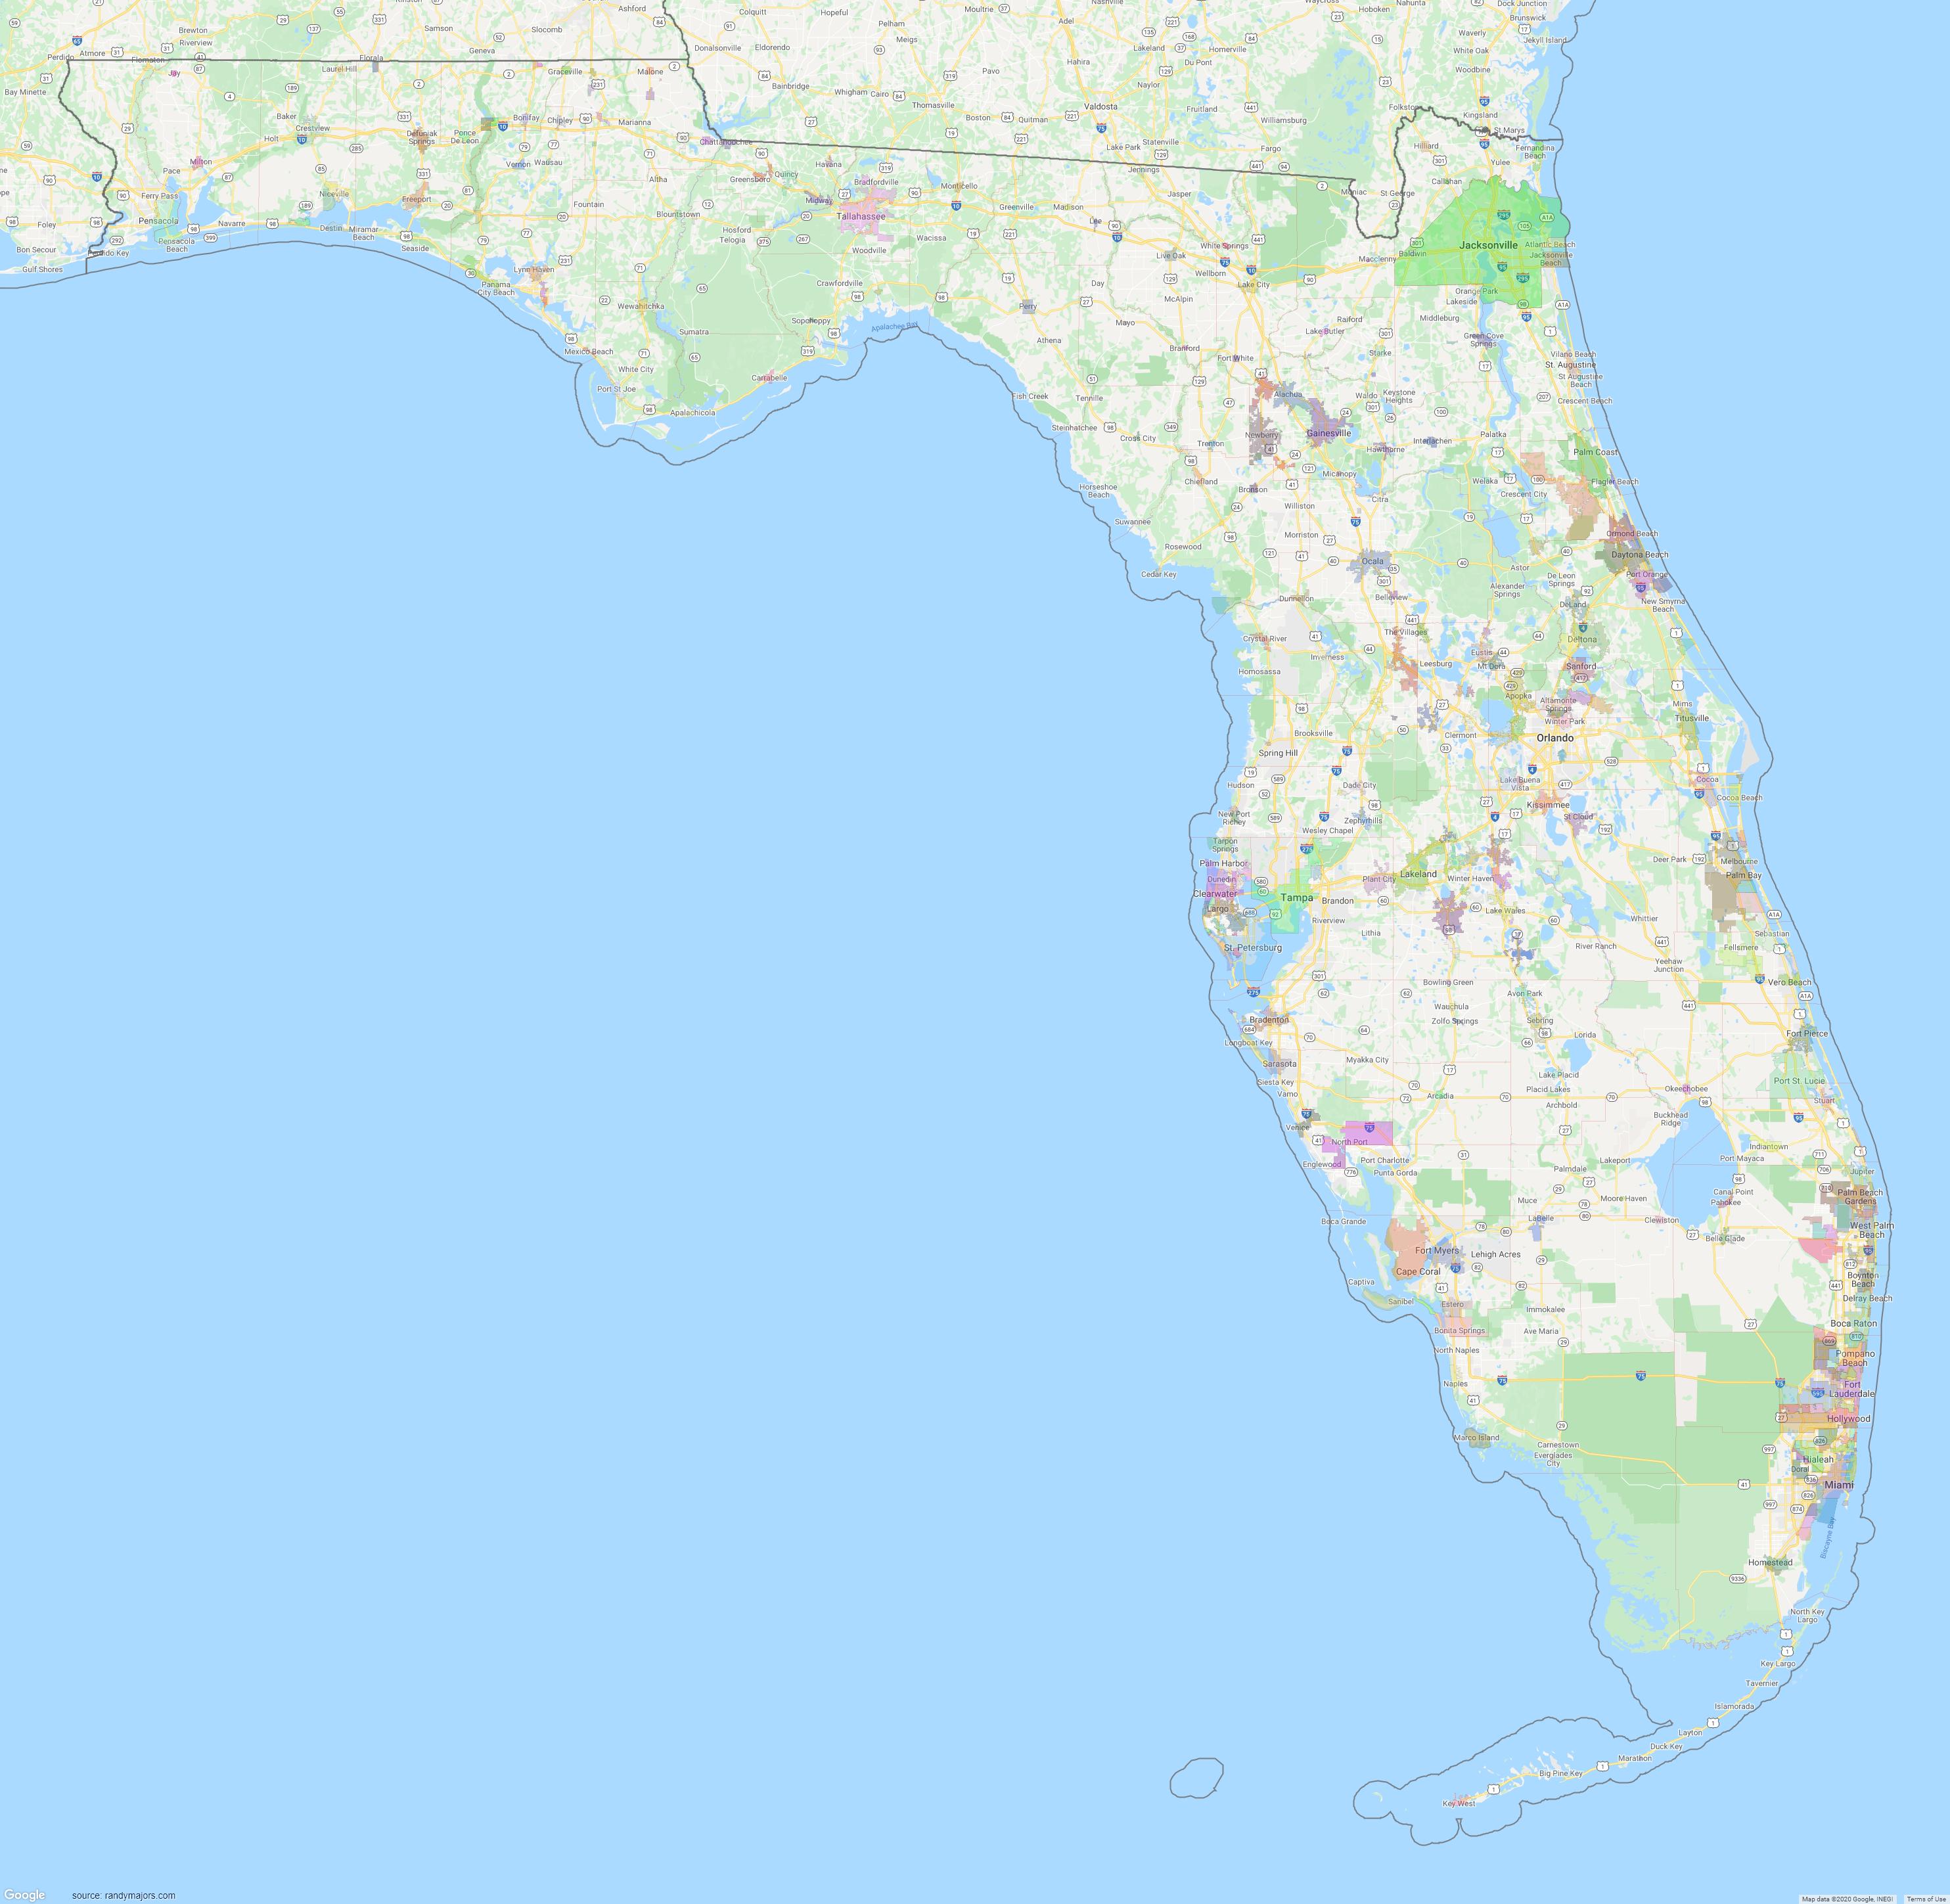 Map of Florida City Limits Map